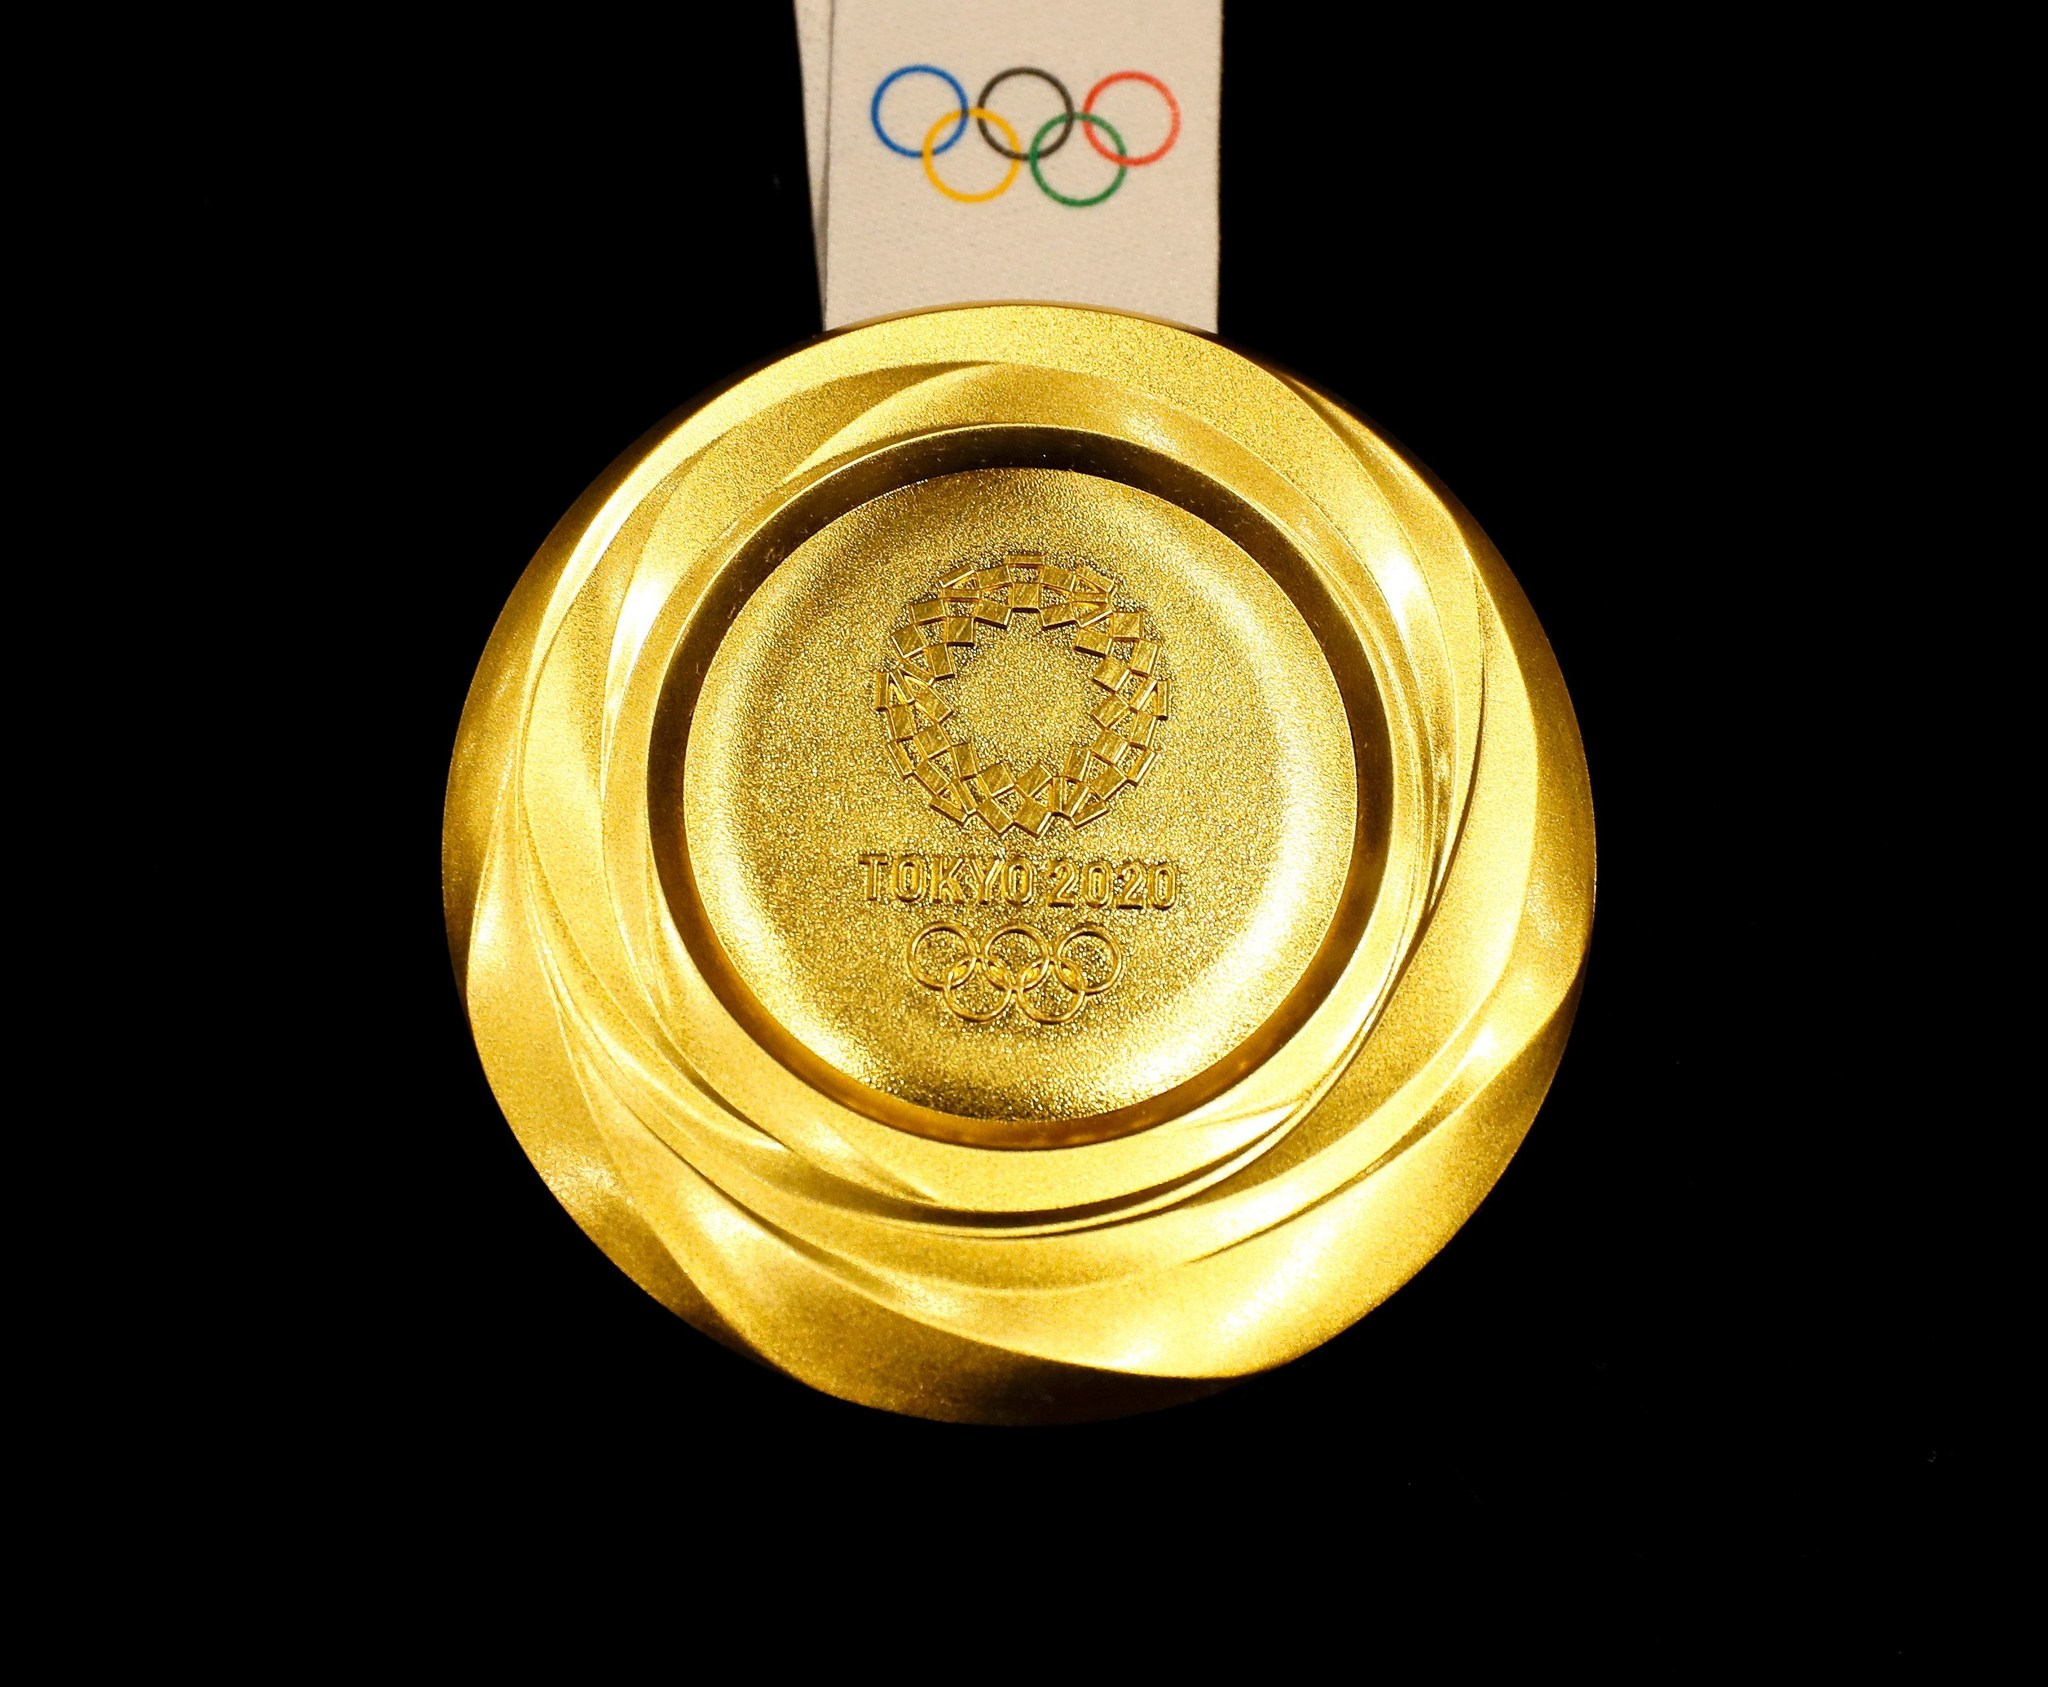 Tokyo Olympics Gold medal